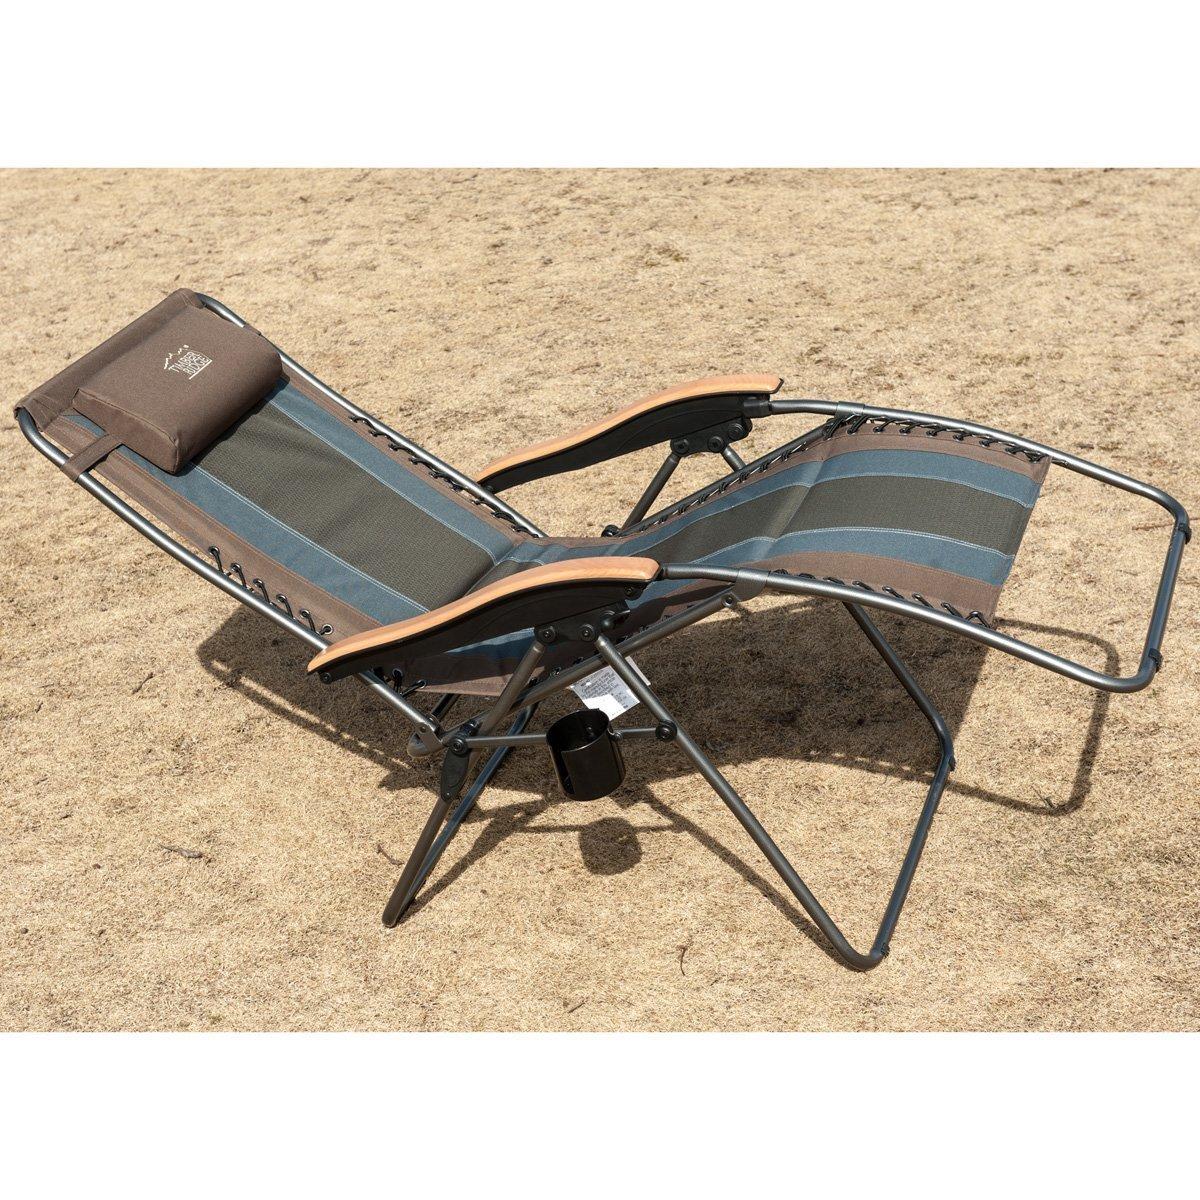 Outstanding Timber Ridge Multicolor Oversized Xl Padded Zero Gravity Chair Machost Co Dining Chair Design Ideas Machostcouk